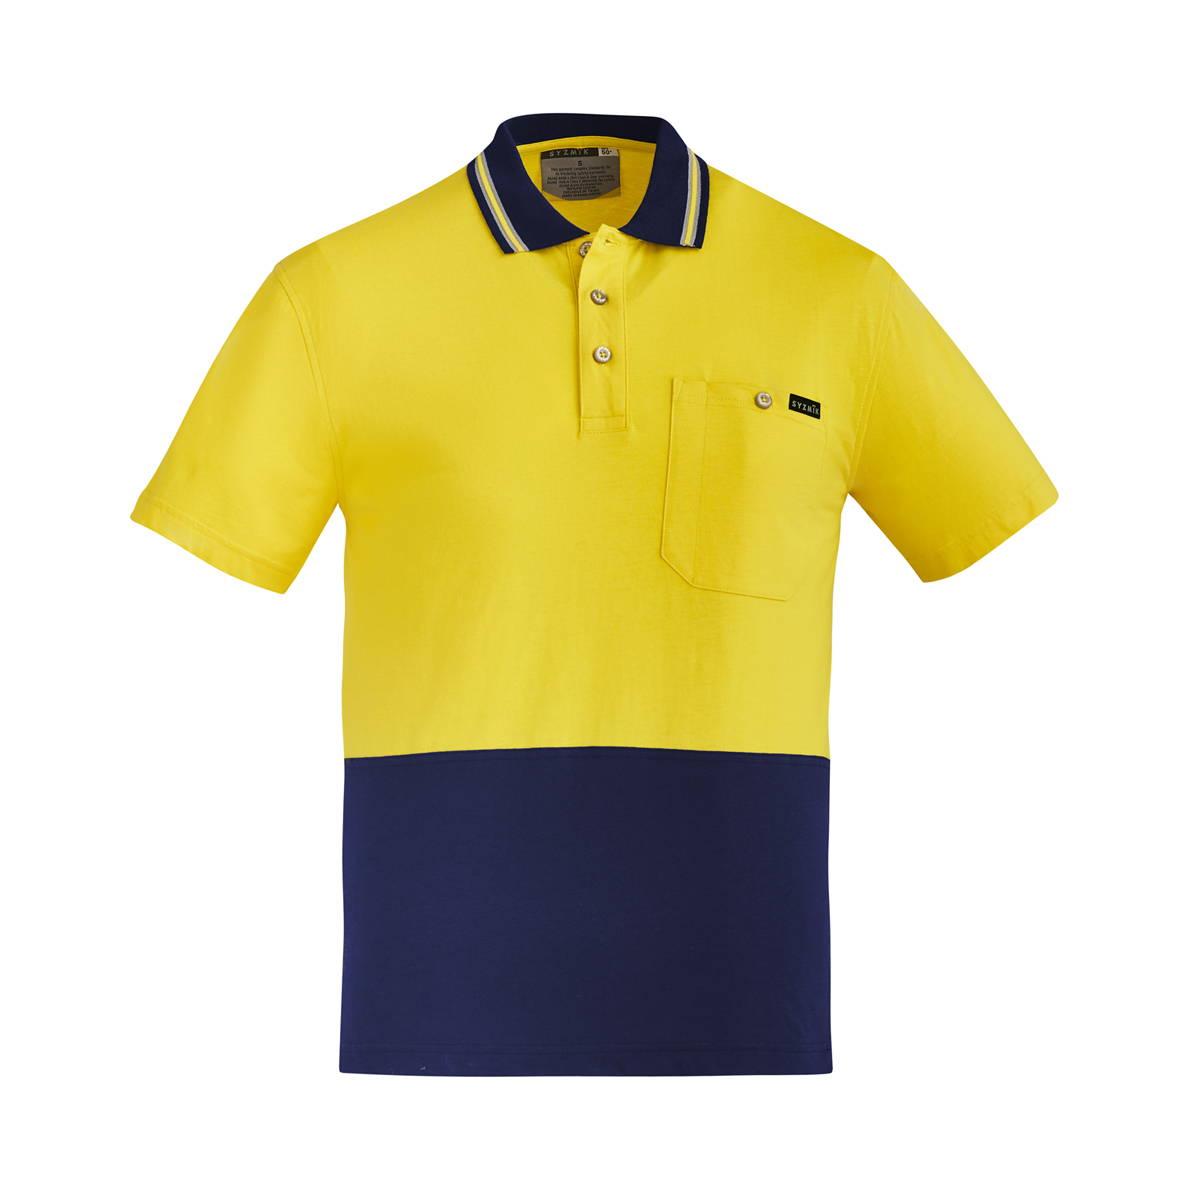 Tradie Shirts & Polos - workwear